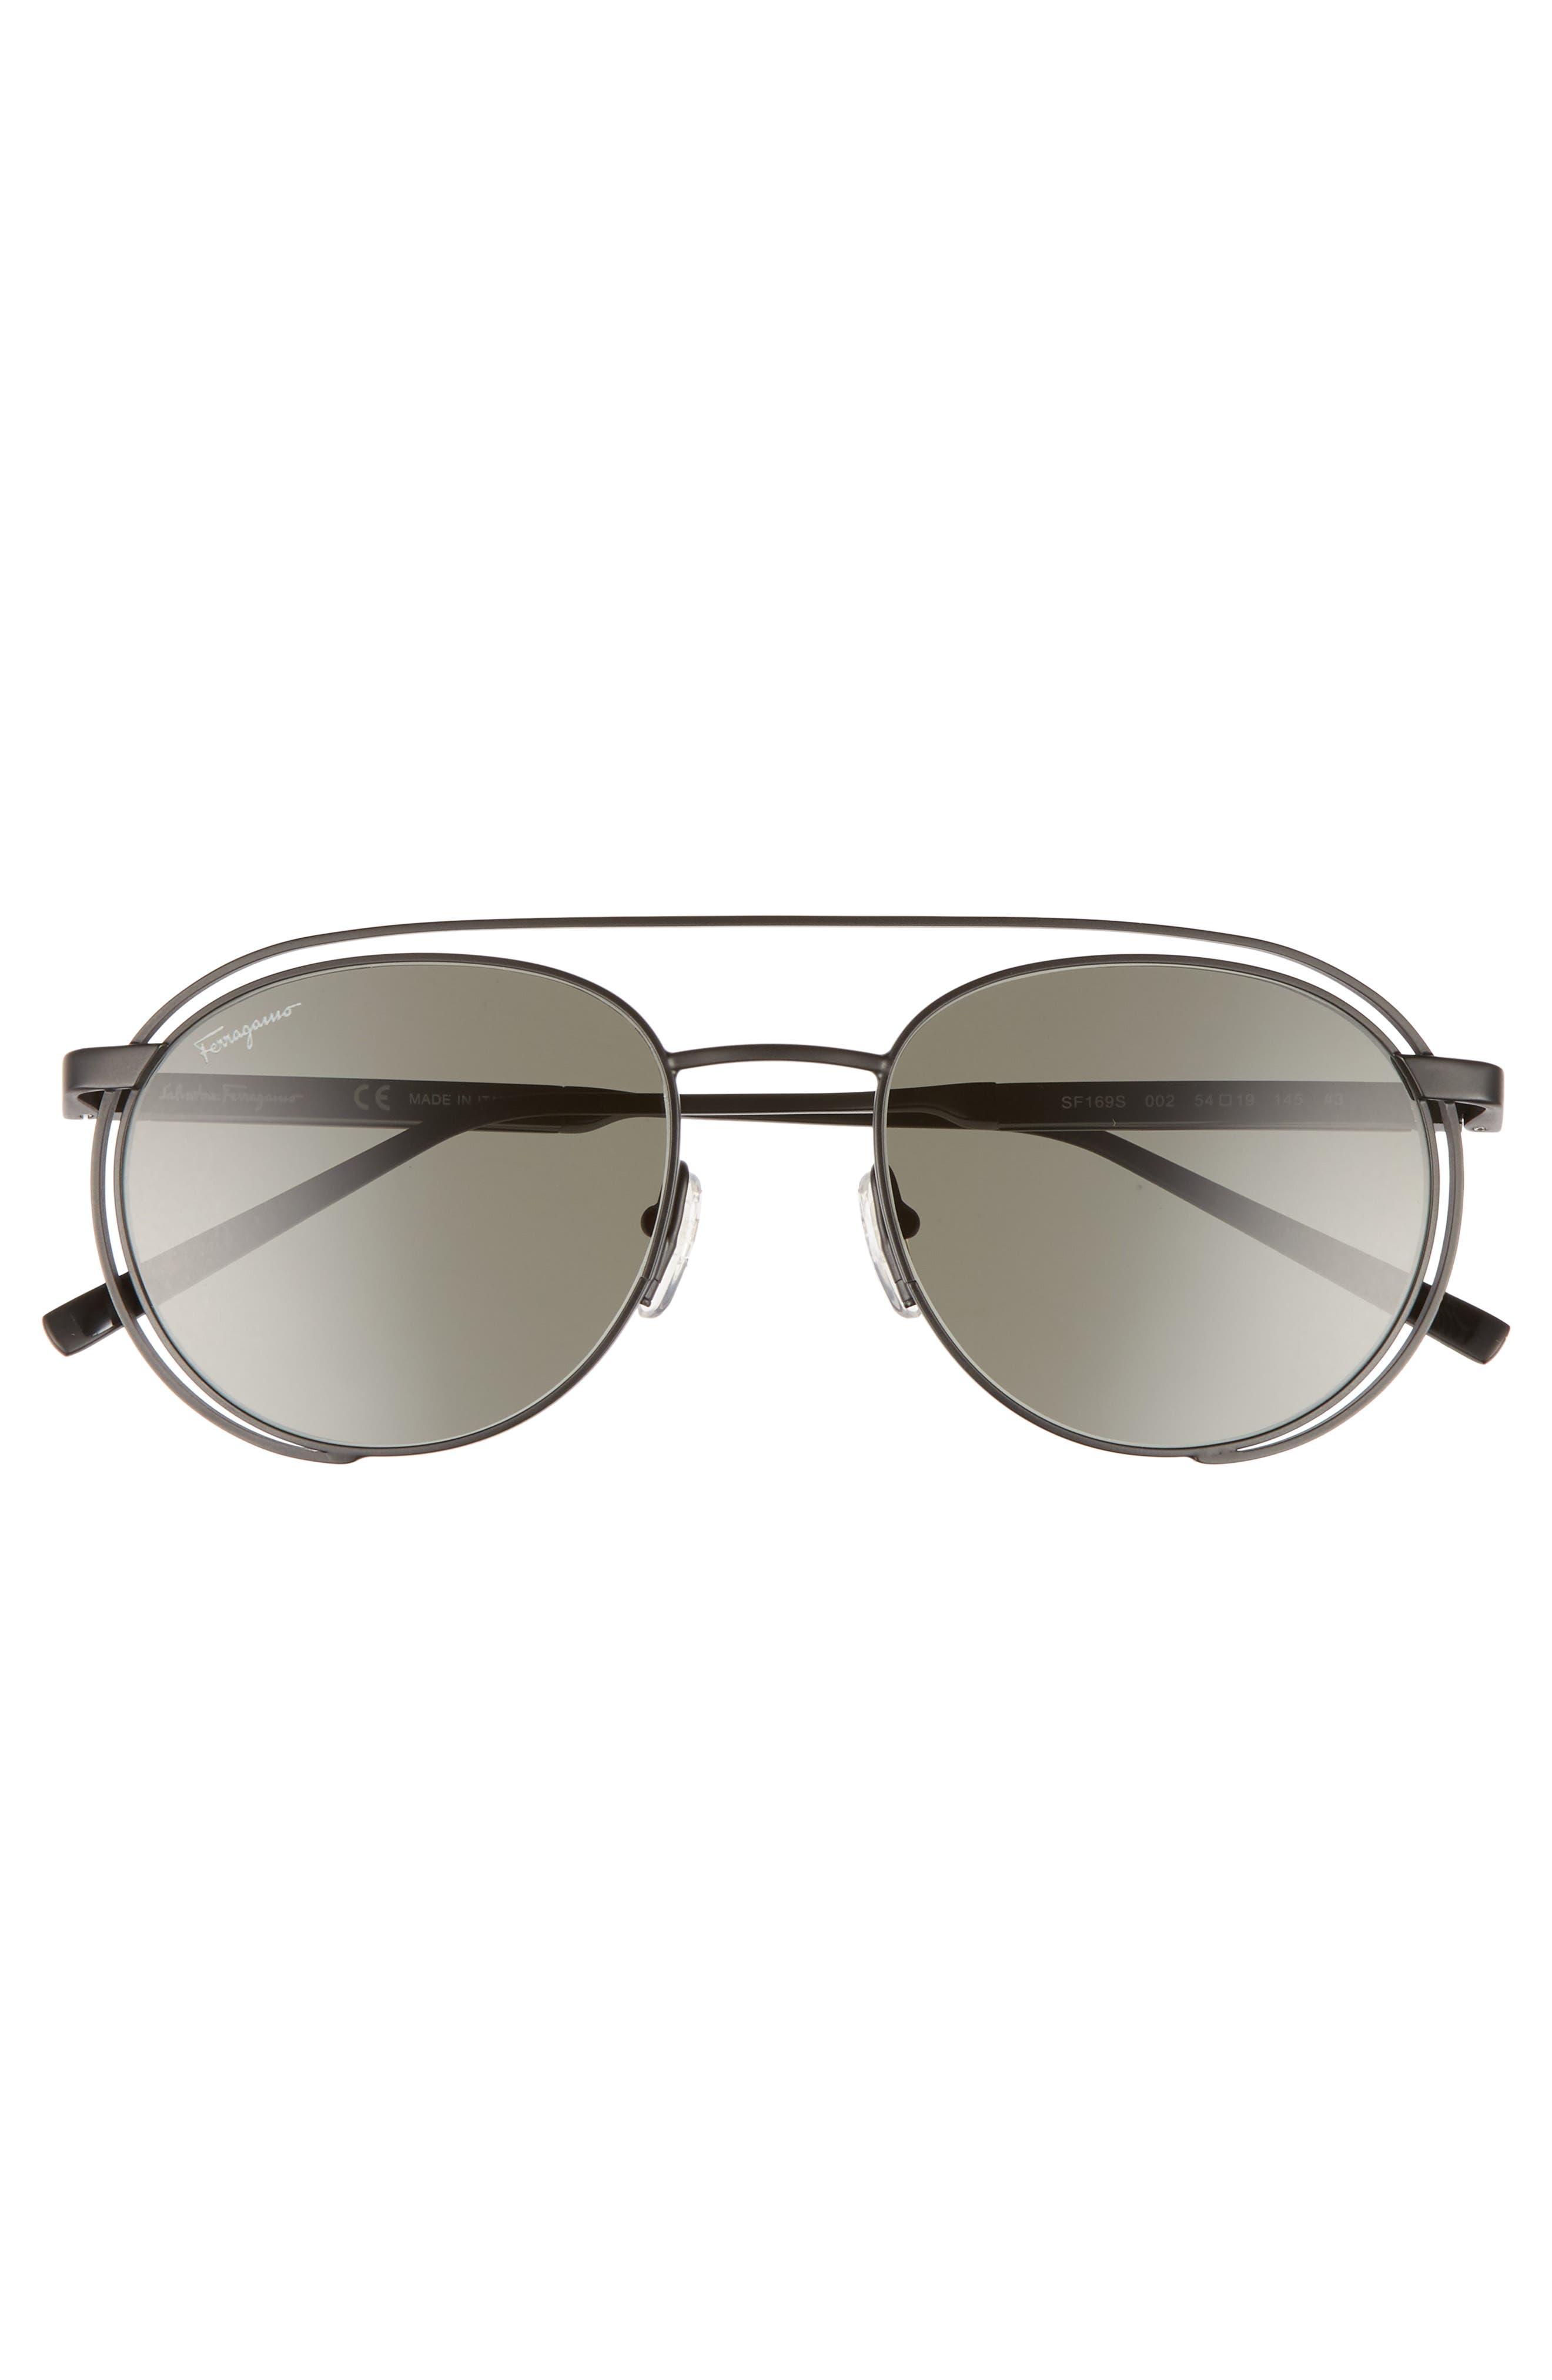 54mm Round Sunglasses,                             Alternate thumbnail 2, color,                             MATTE BLACK